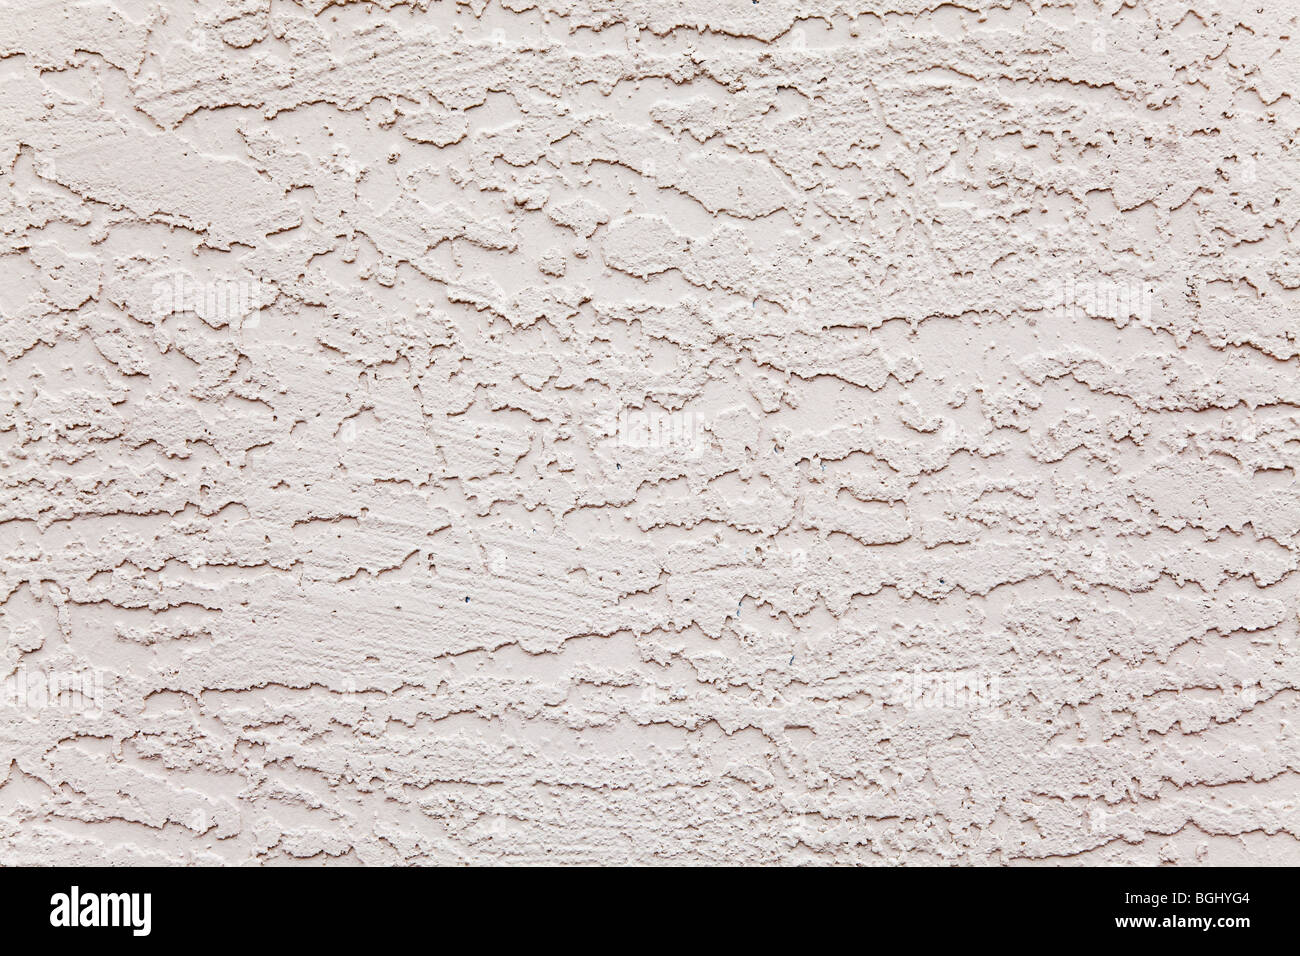 äußeren weißen Stuck Wand grobe Hintergrundmuster Stockbild